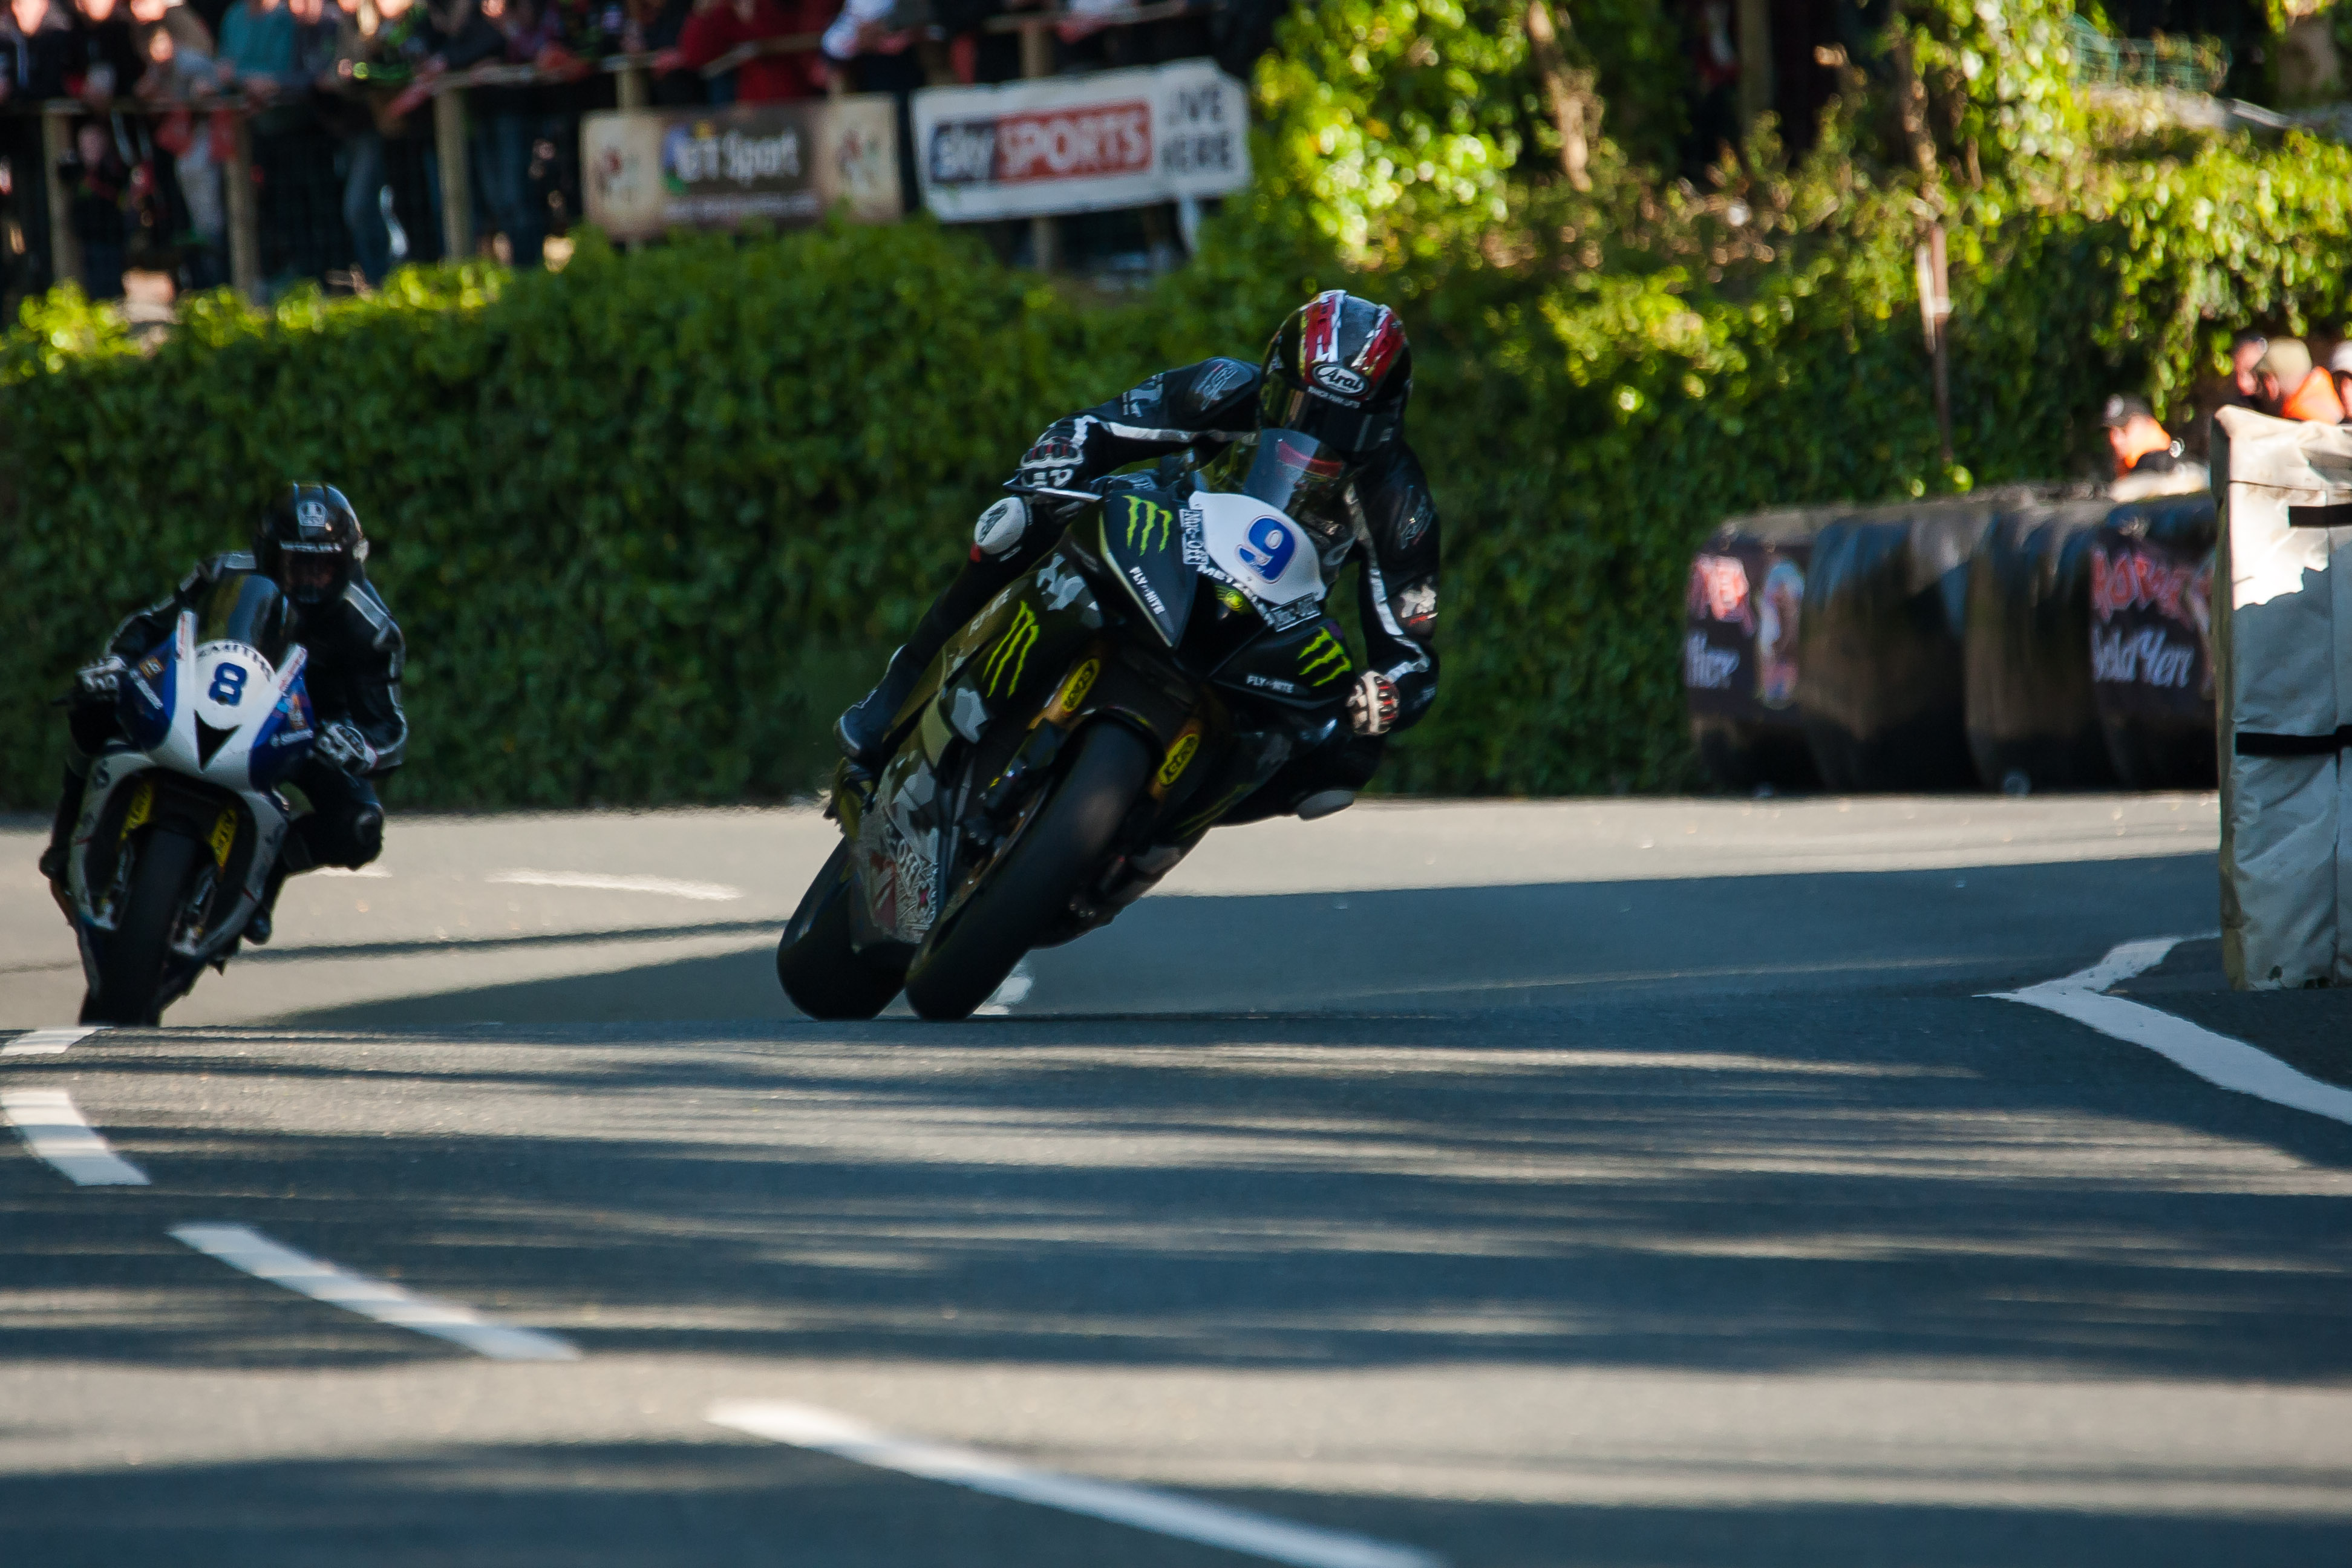 Ian-Hutchinson-Monster-Energy-Supersport-1